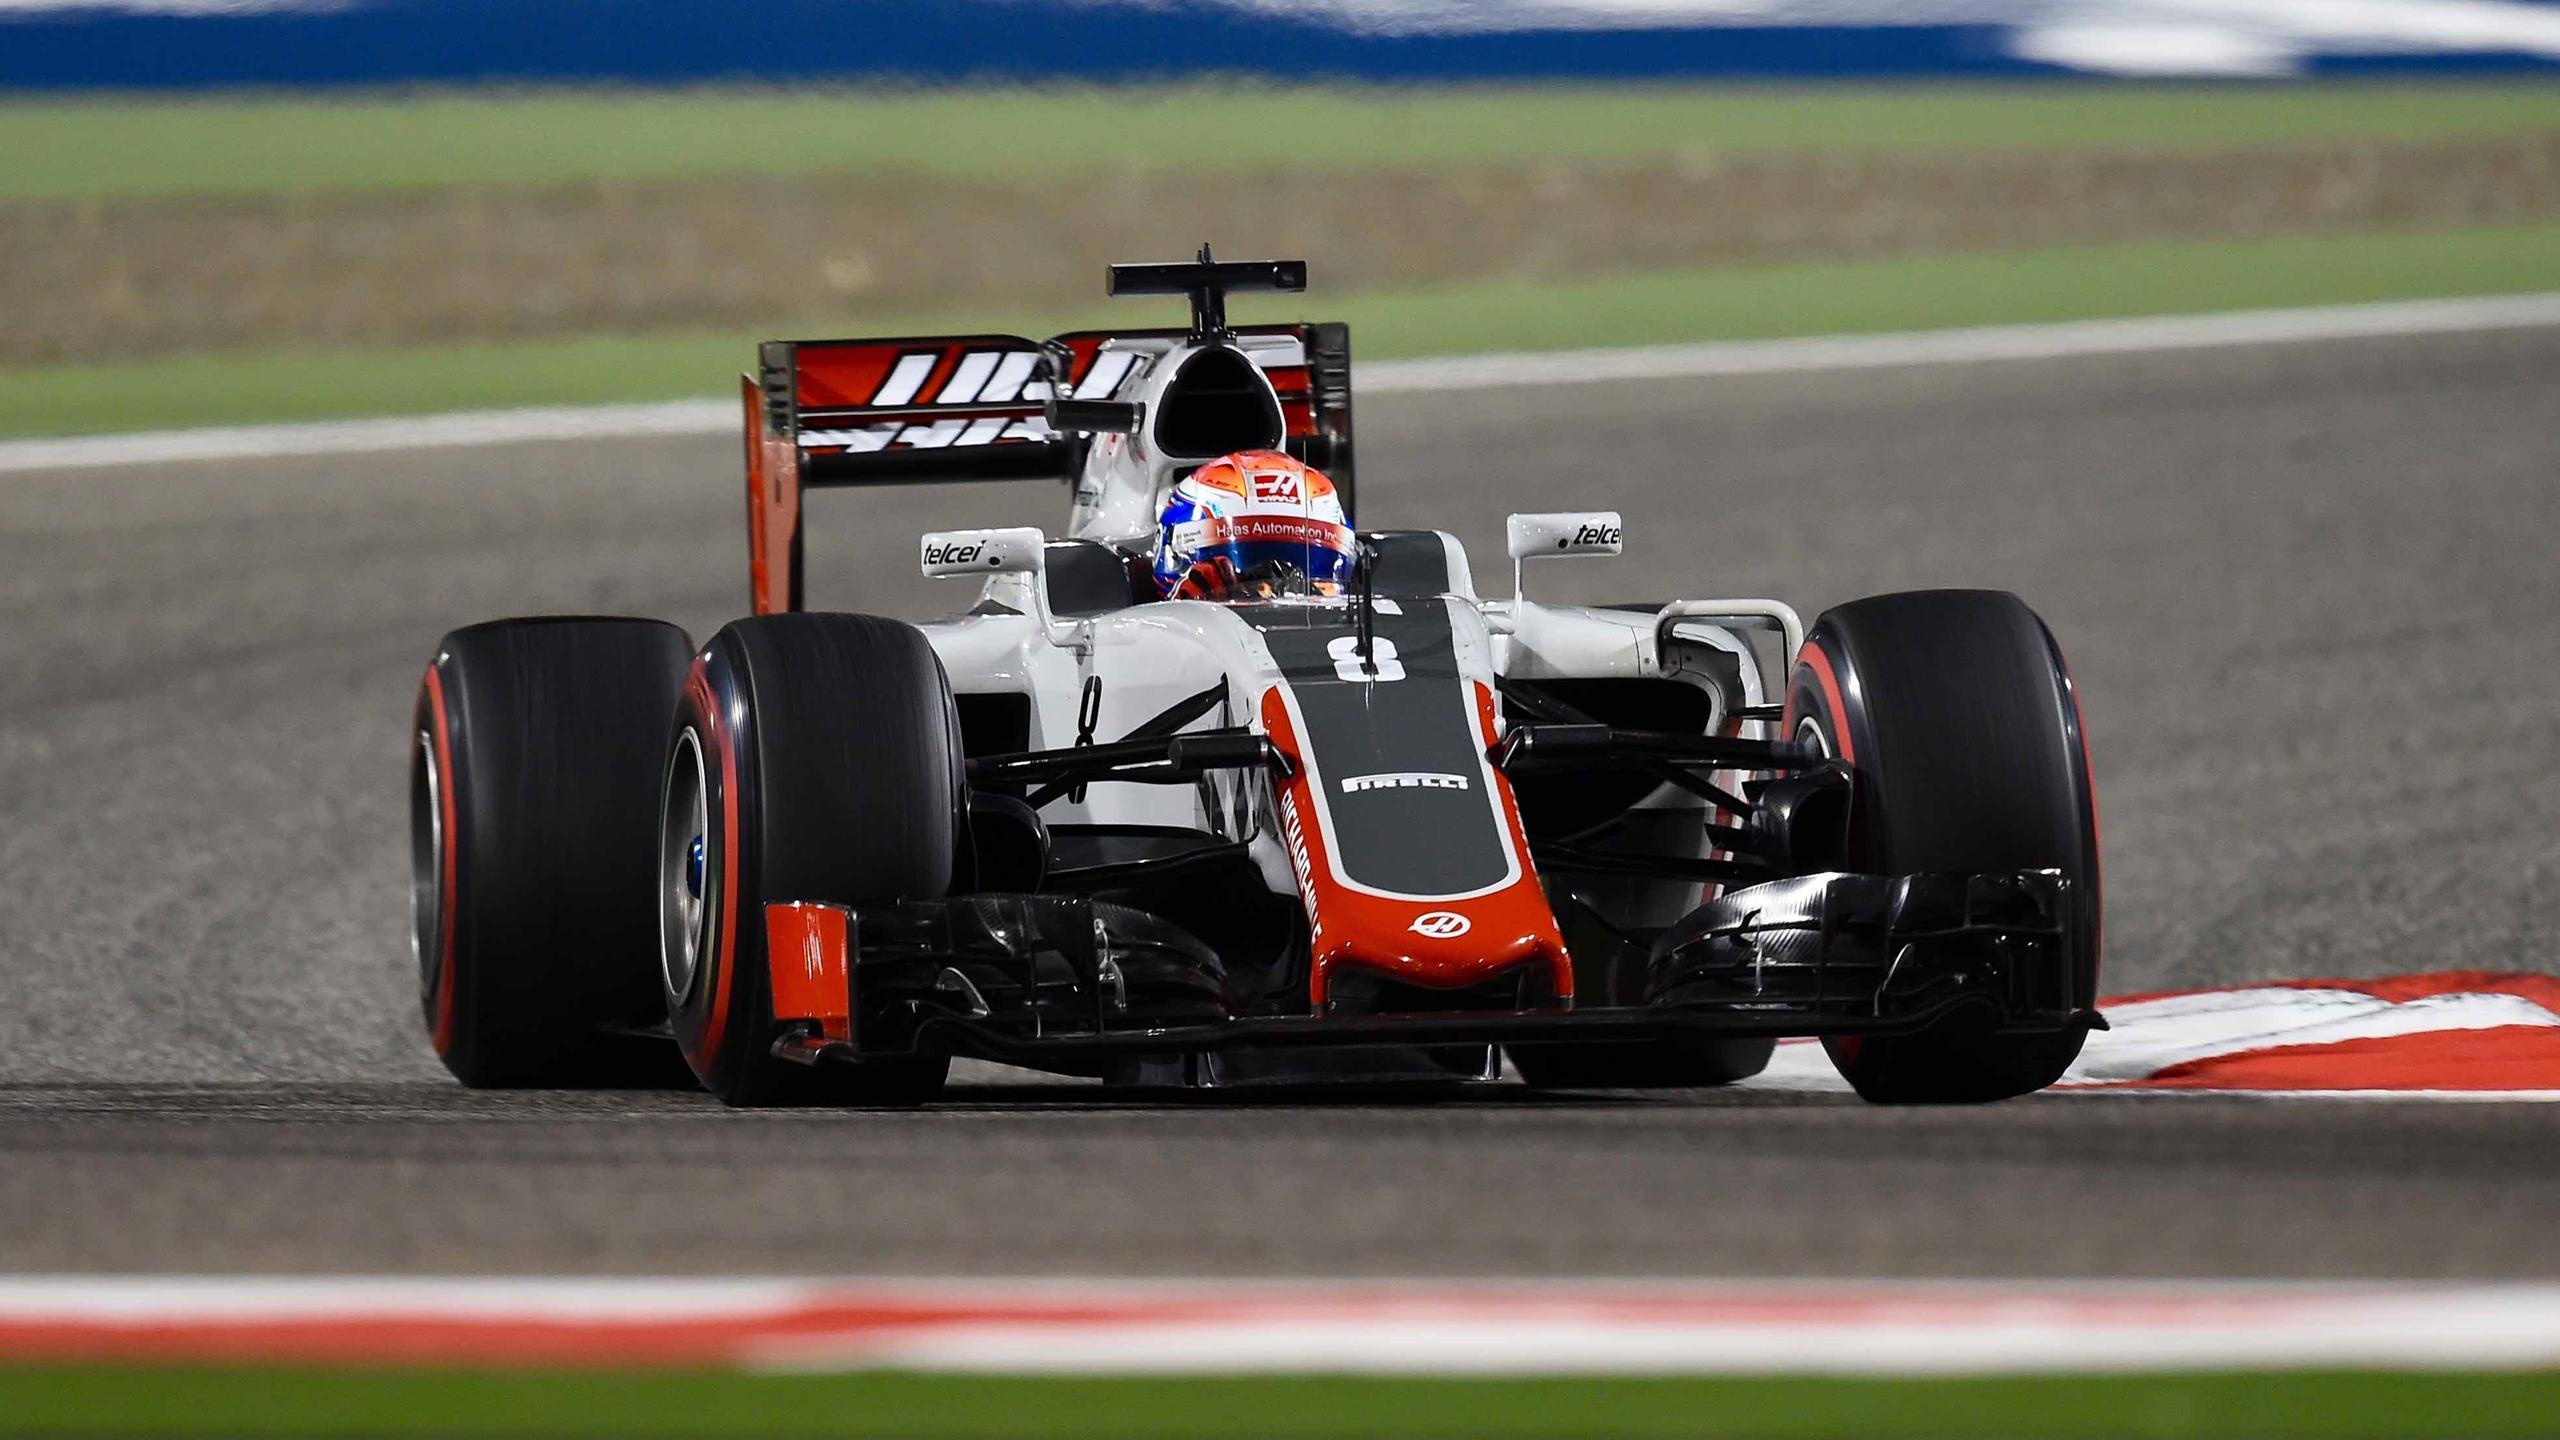 Romain Grosjean (Haas) au Grand Prix de Bahreïn 2016